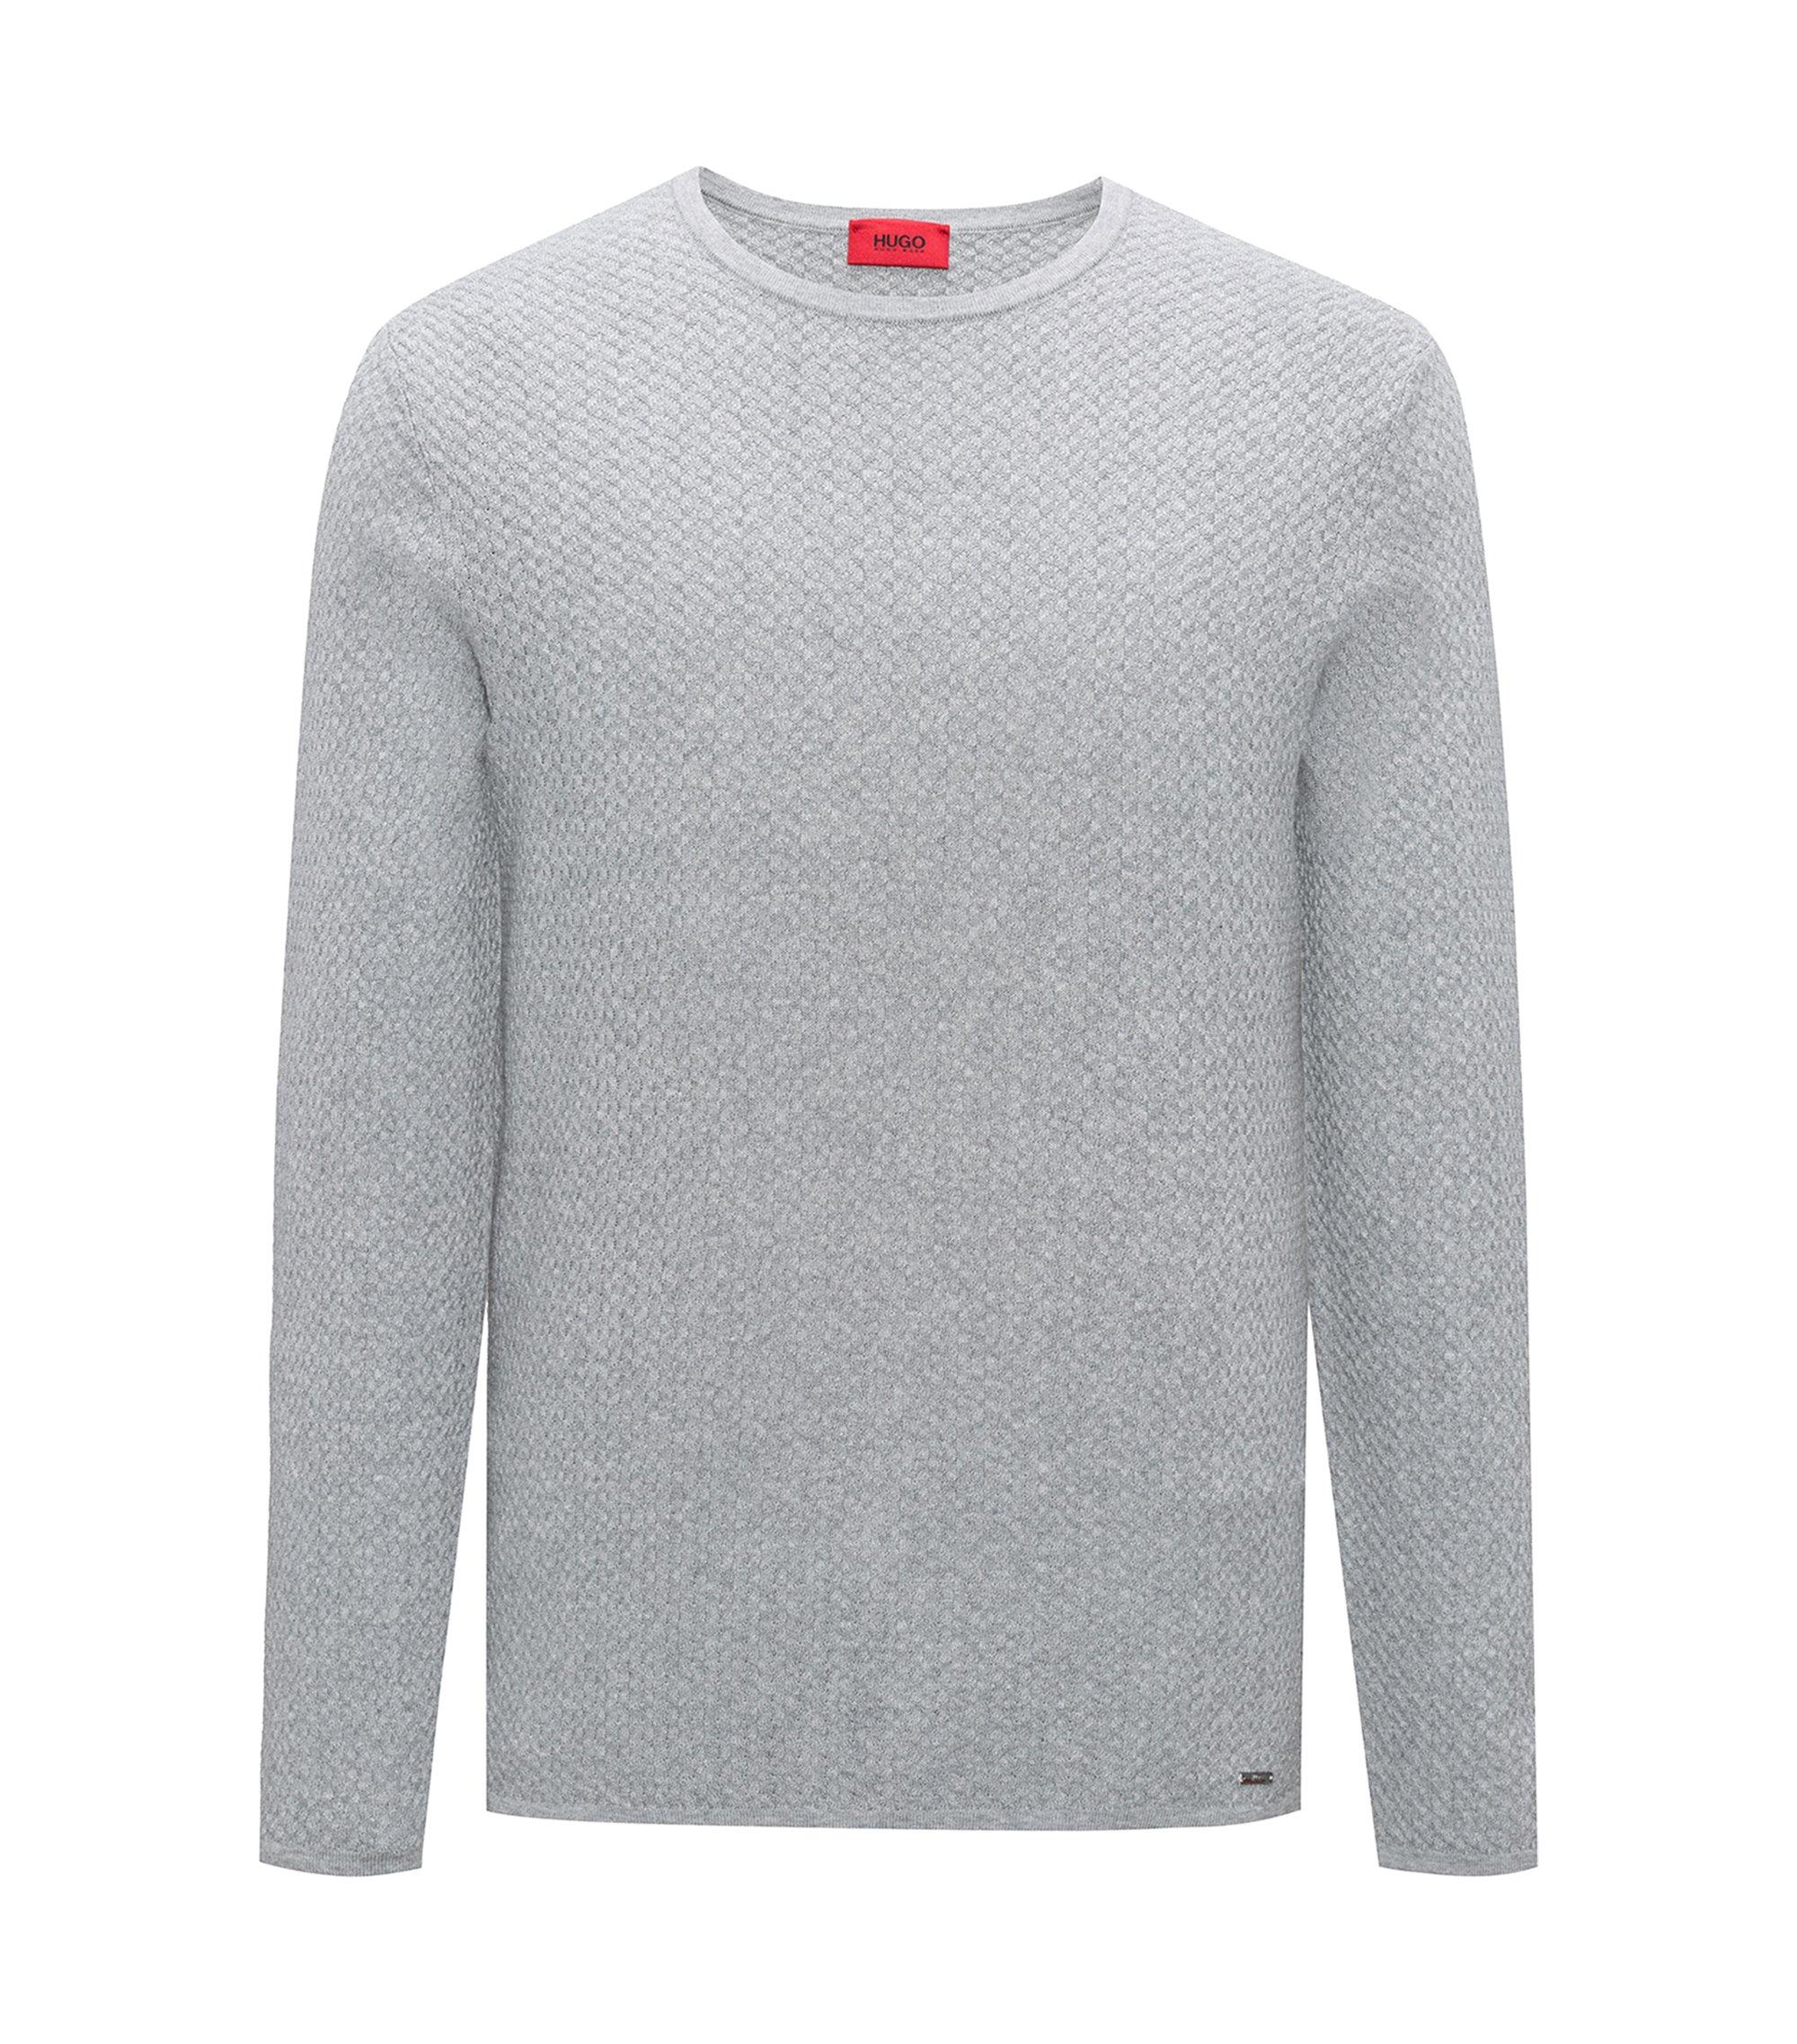 Slim-fit sweater in herringbone cotton jacquard, Open Grey